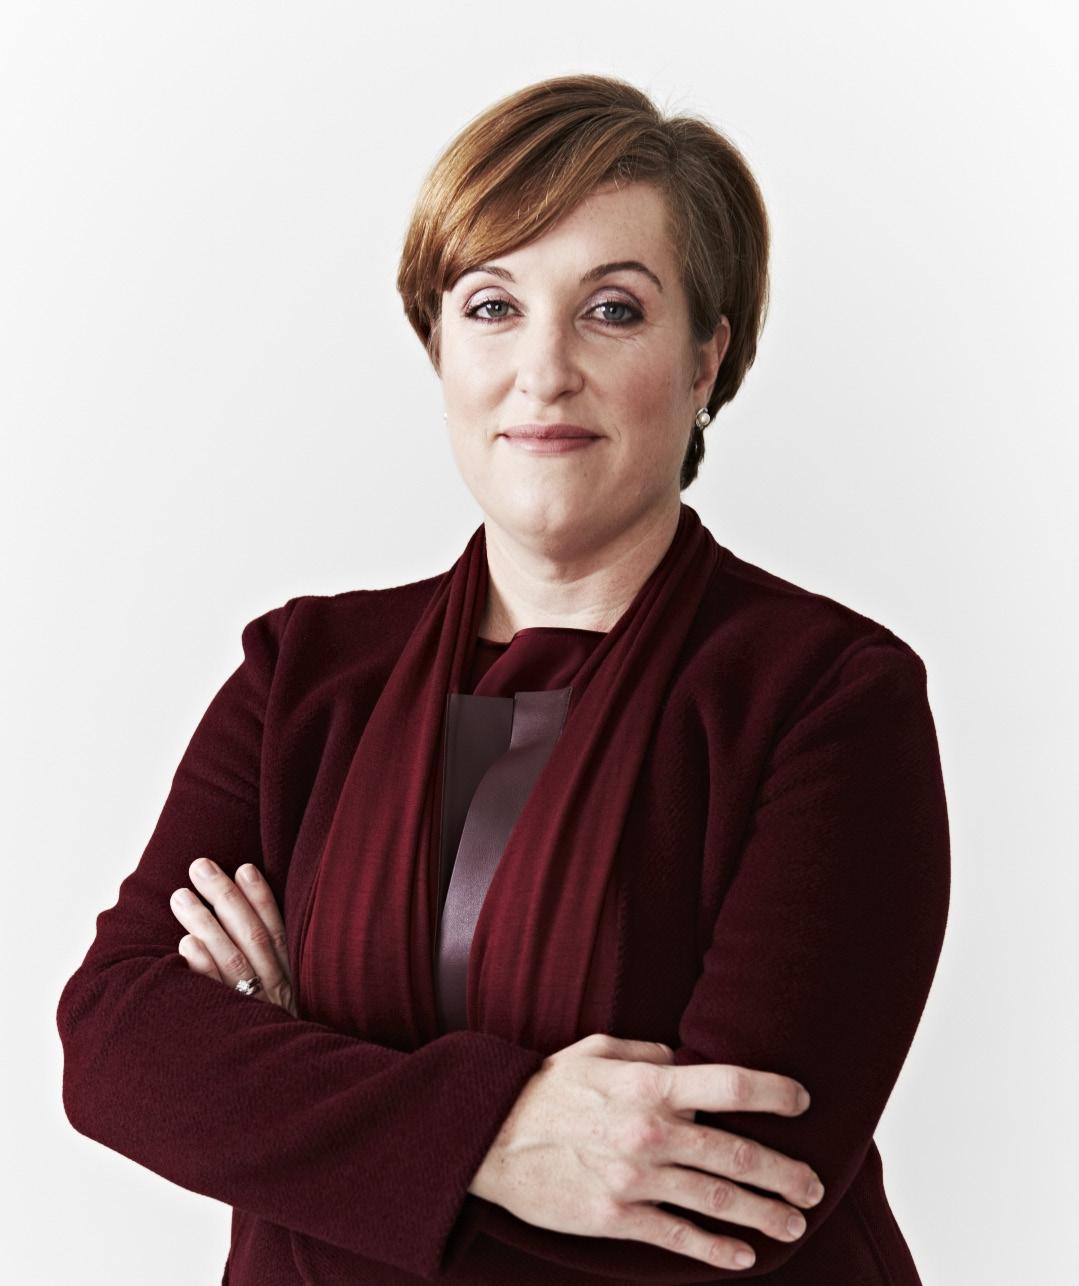 DeAnne Steele, CFA, CAIA  Managing Director &Investment Executive - Western United States, U.S. Trust